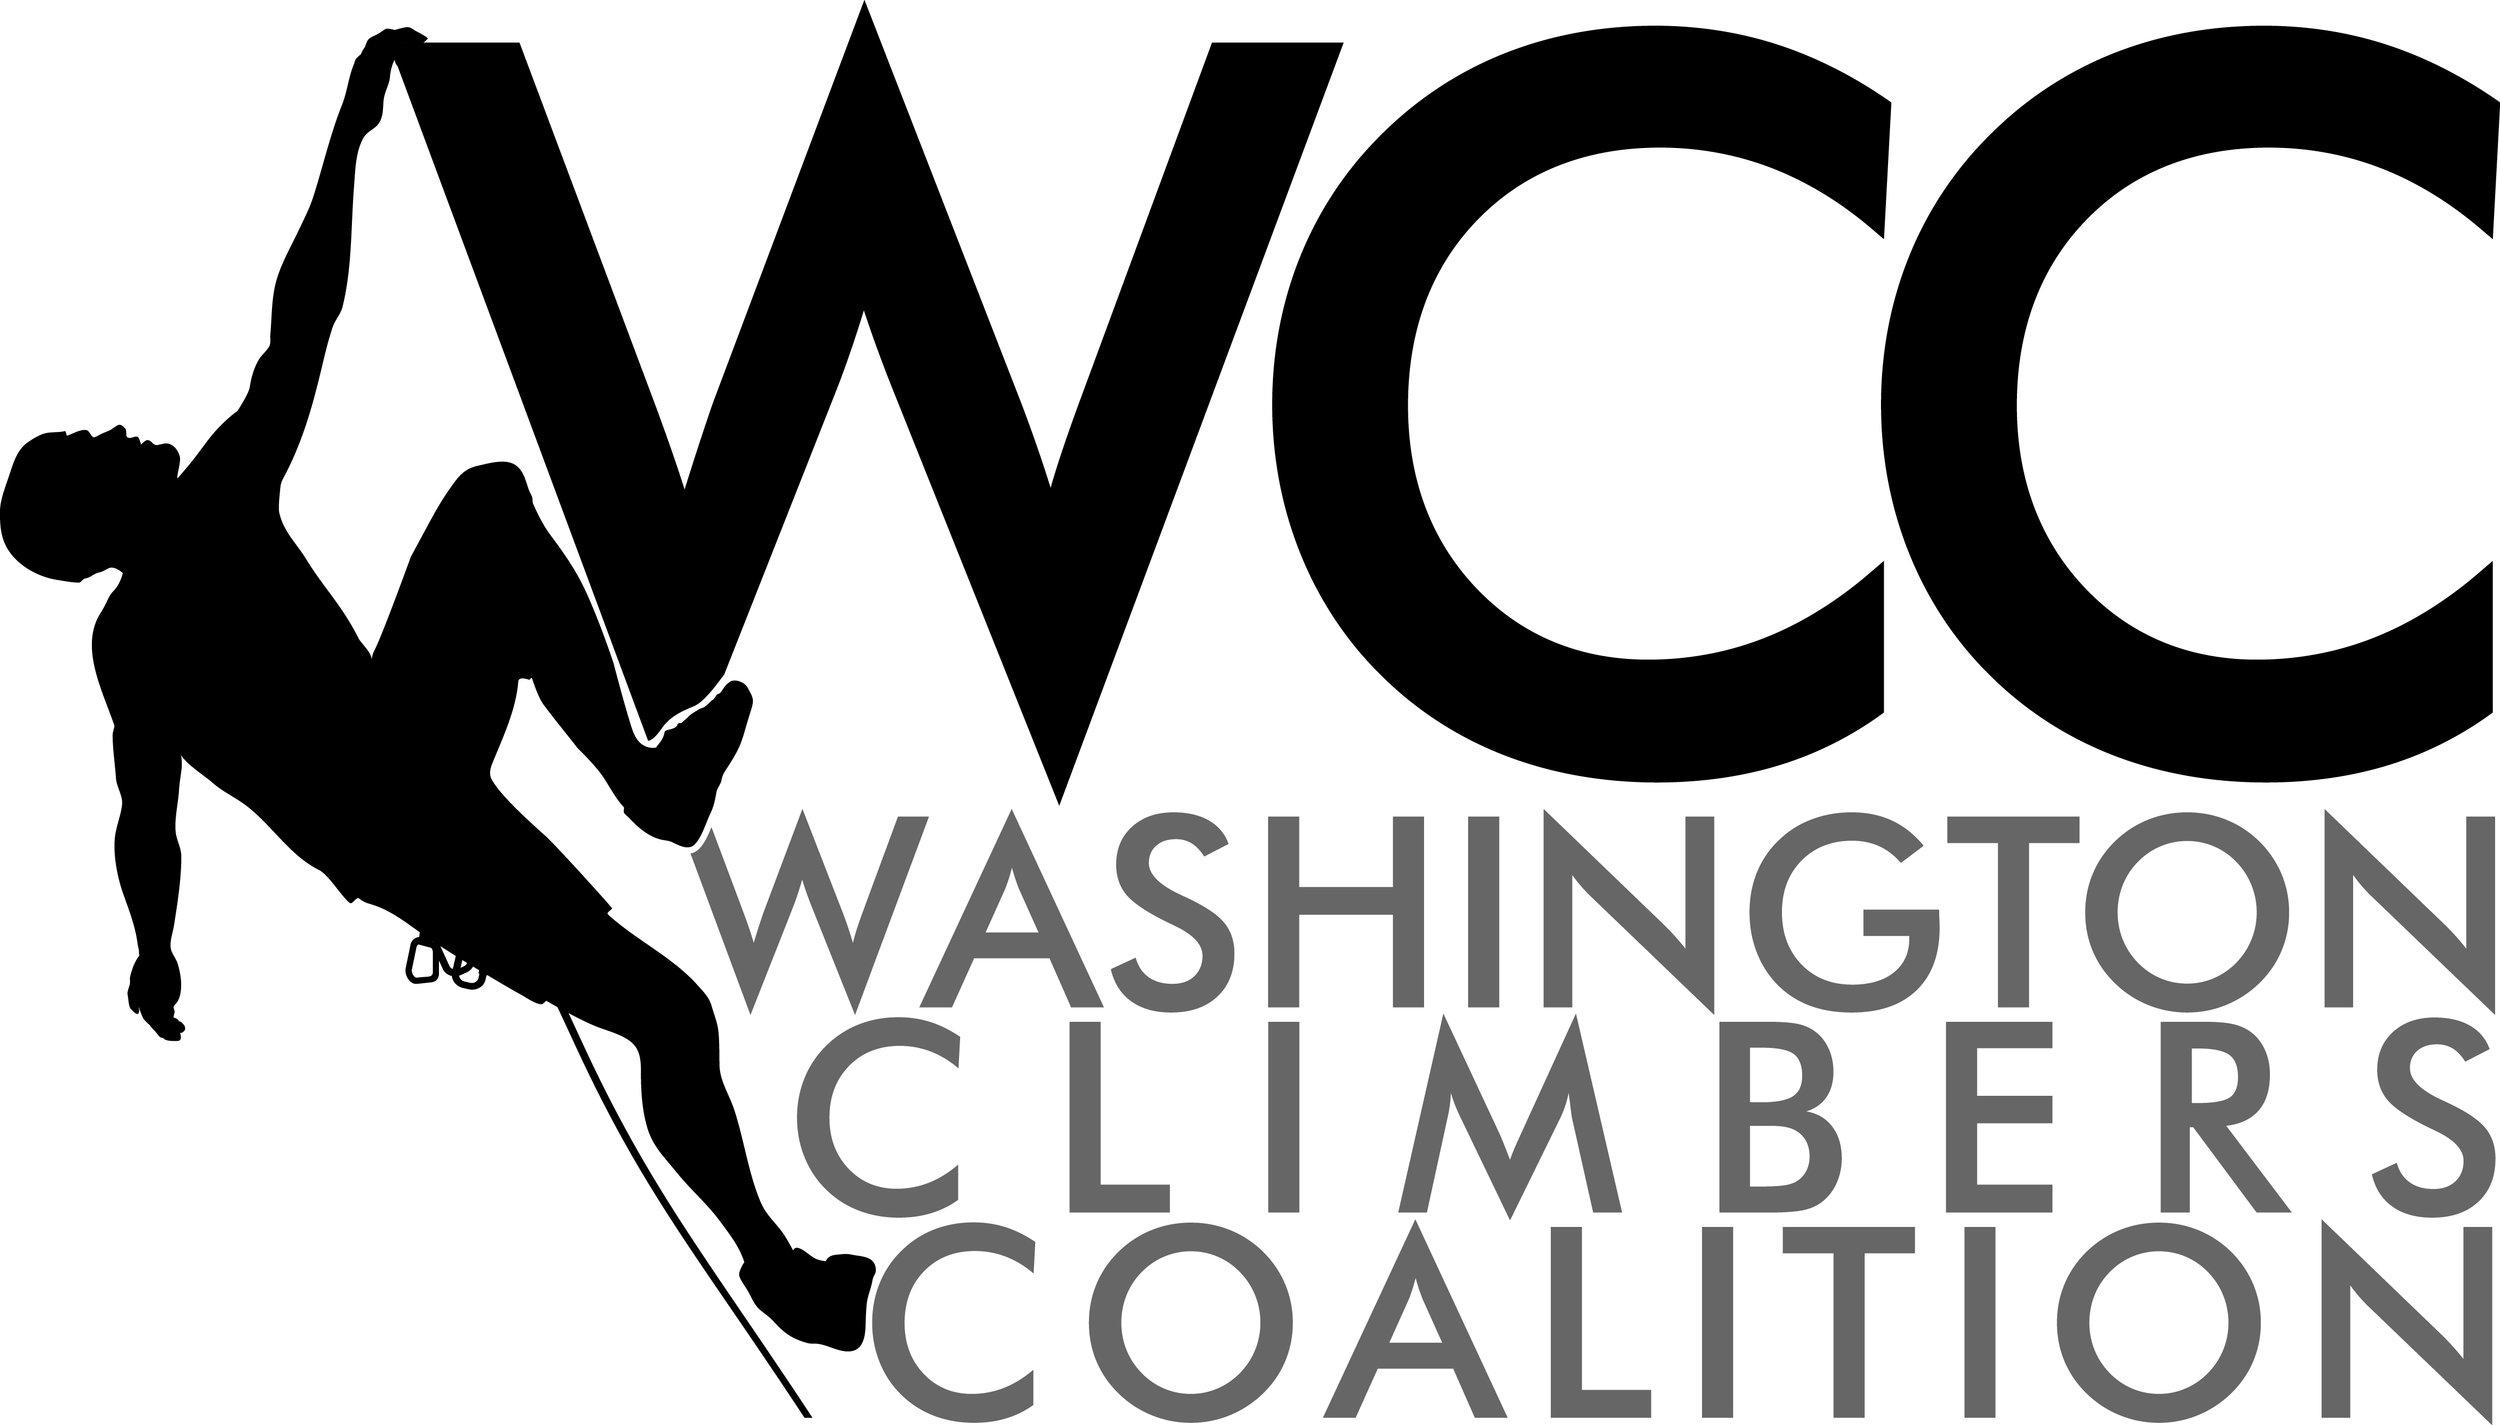 Washington Climbers Coalition.jpg